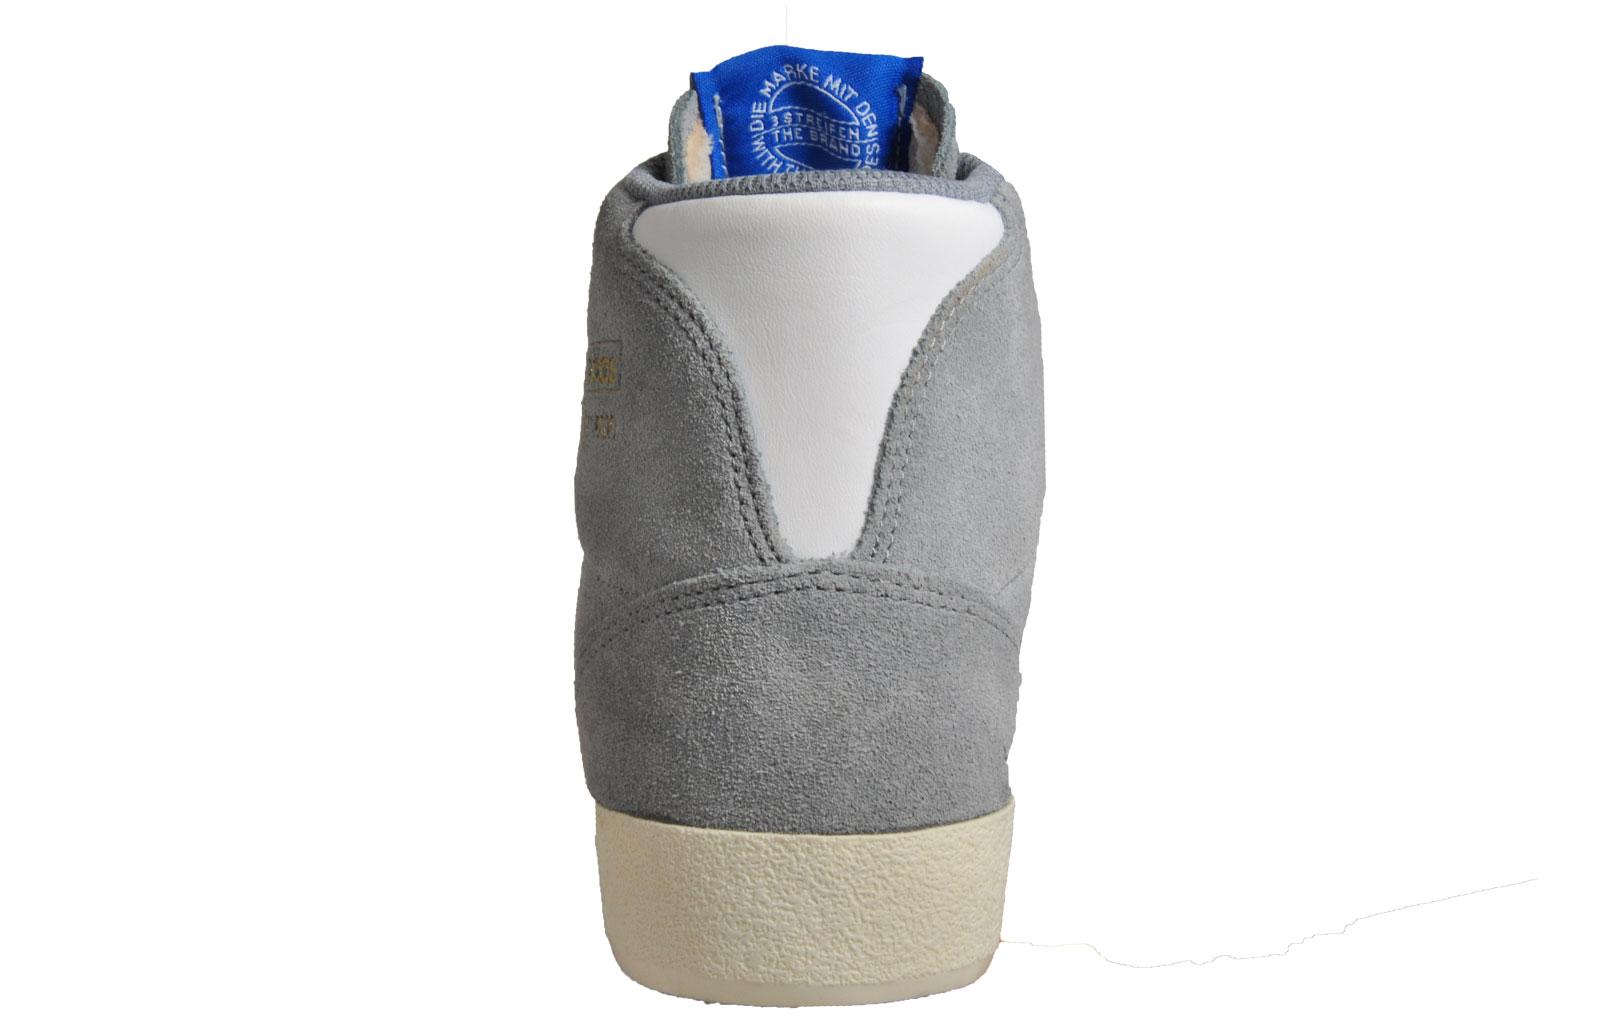 finest selection 584be b7fdf Adidas Originals Basket Profi Hi Uni Classic Basketball Retro Trainers Grey  B Grade